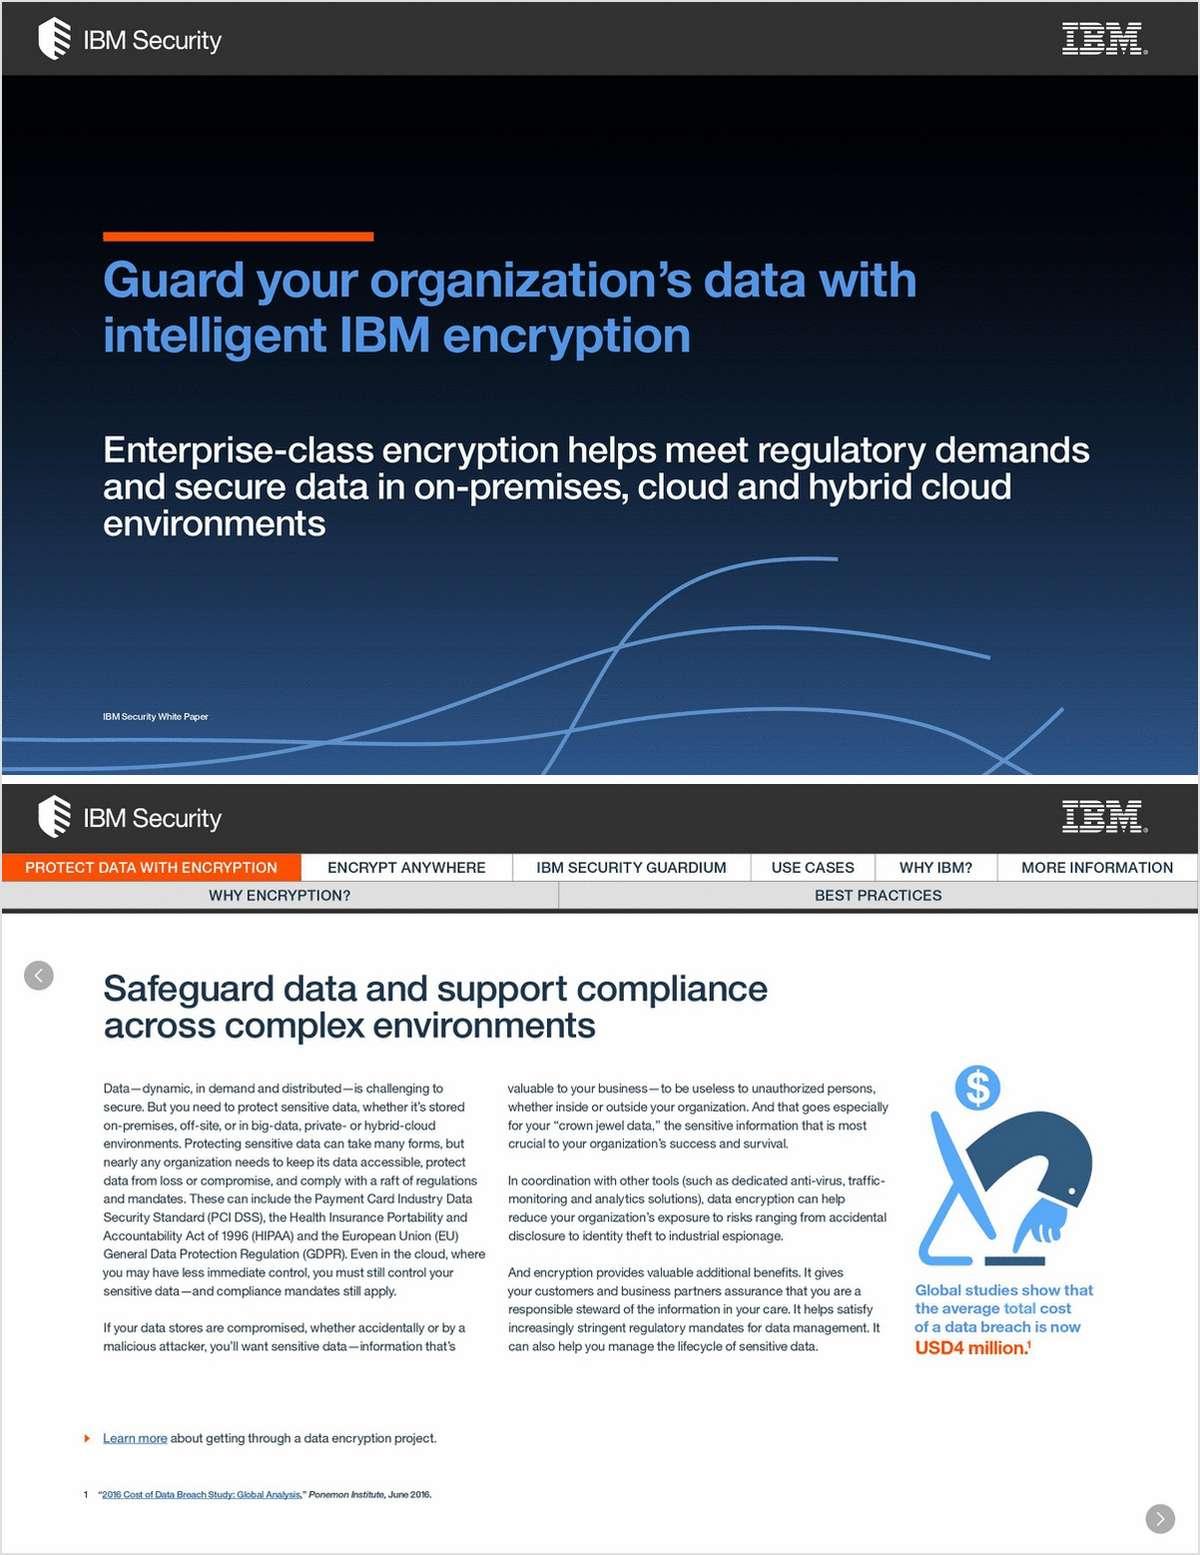 Guard Your Organization's Data with Intelligent IBM Encryption